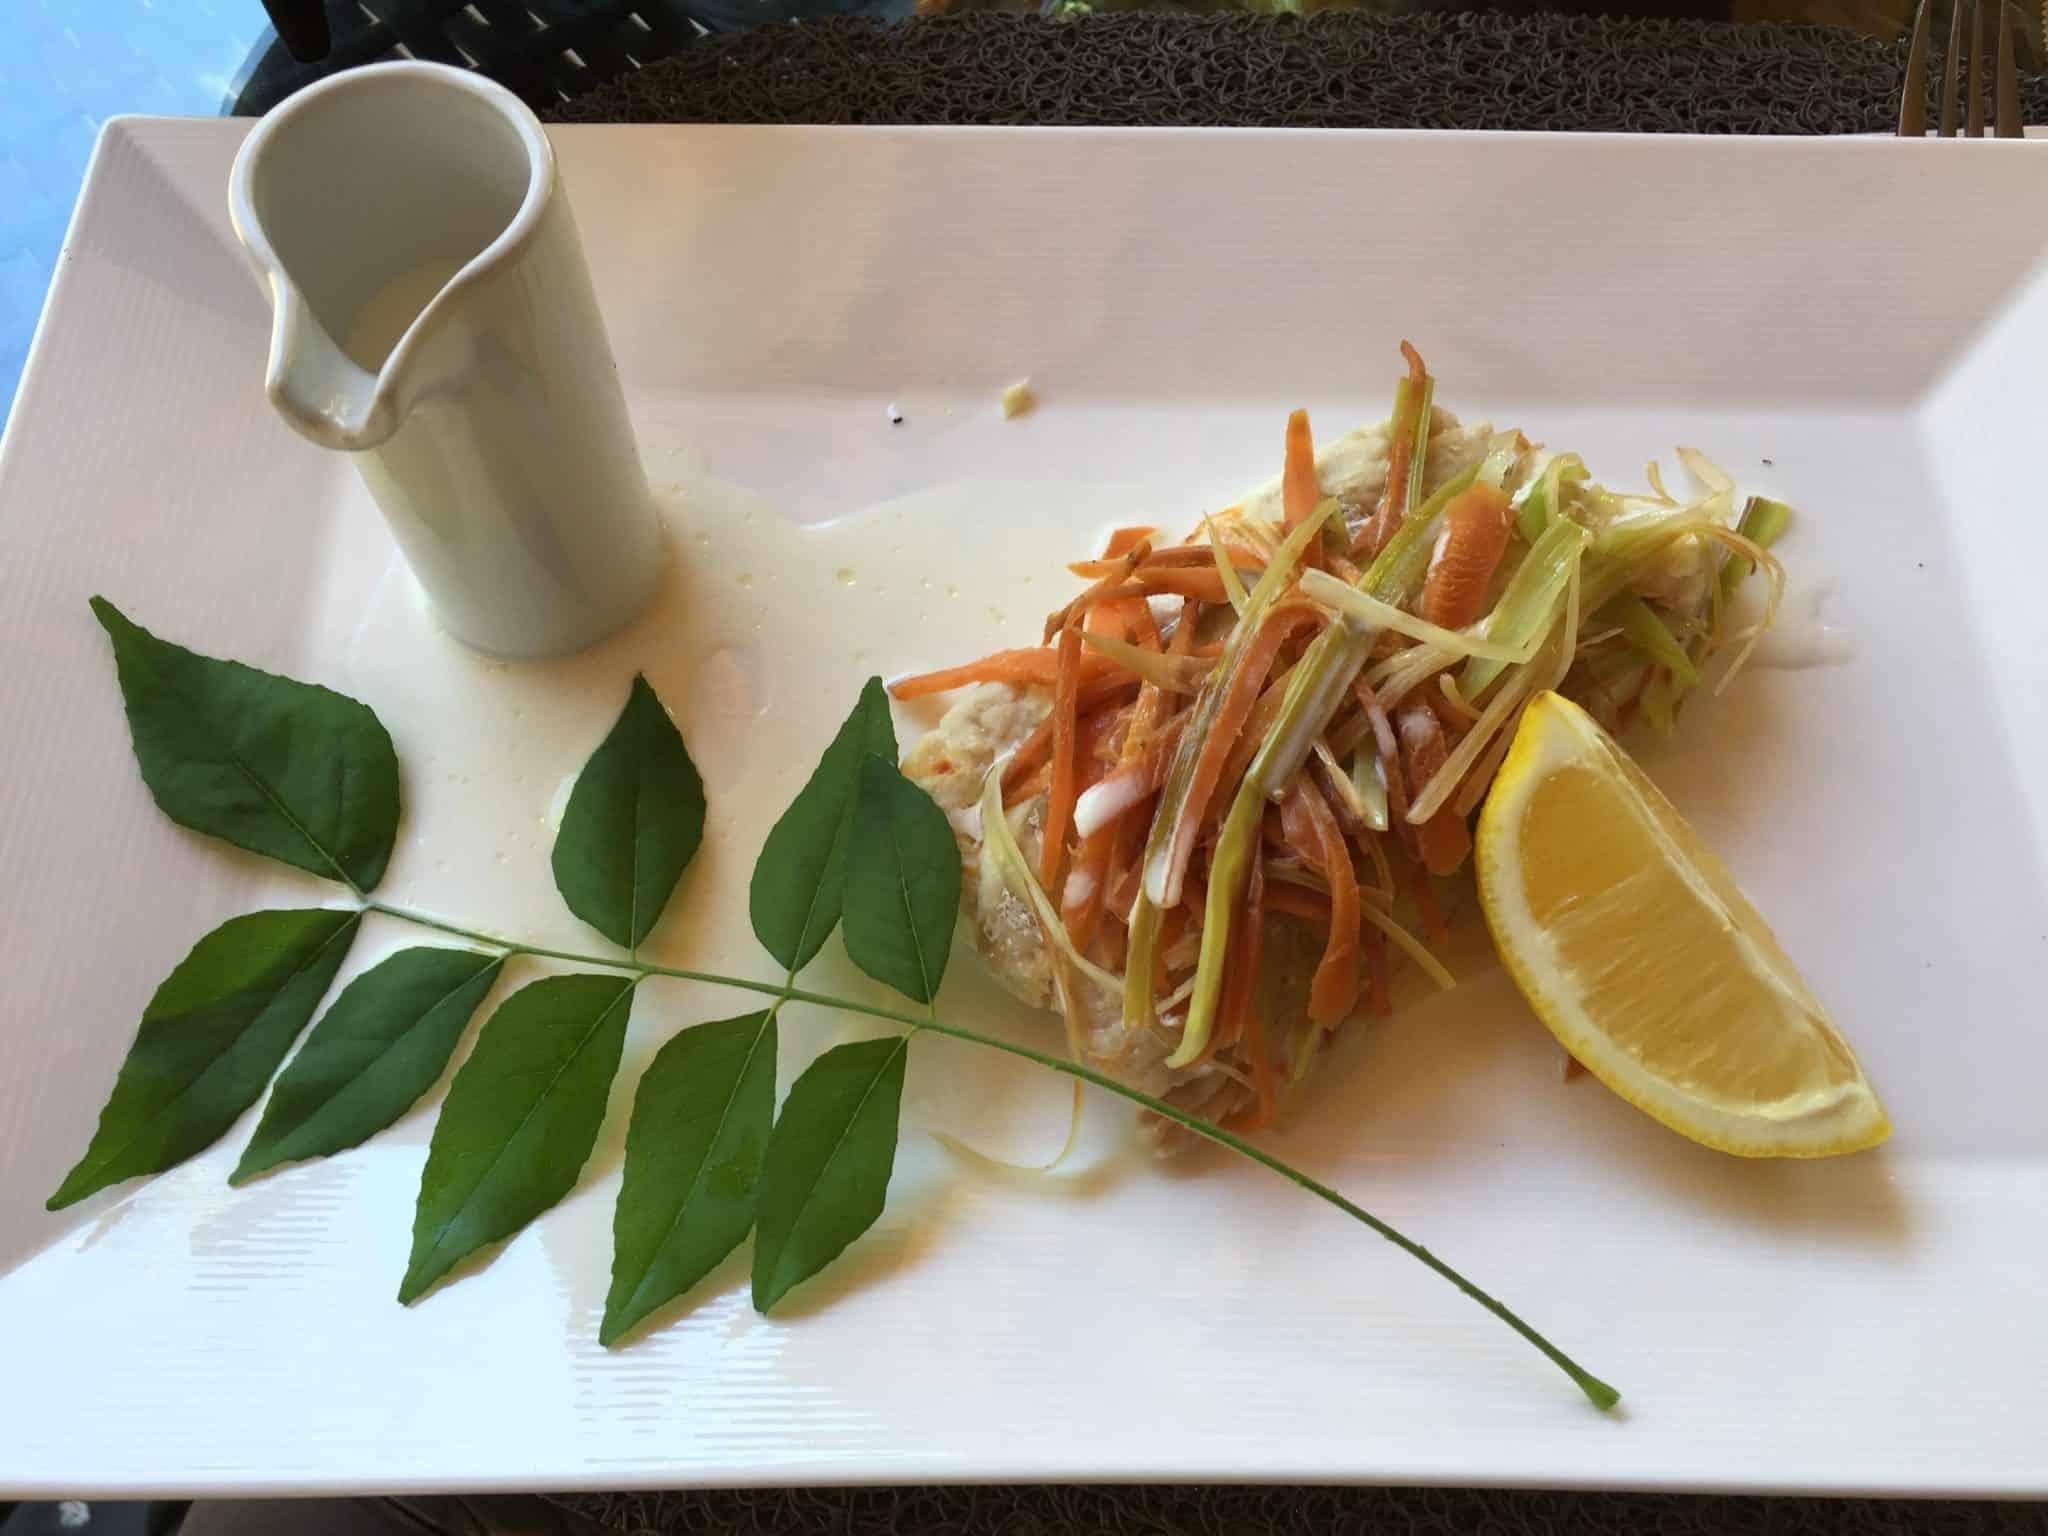 Paradisier Restaurant - Parrot Fish